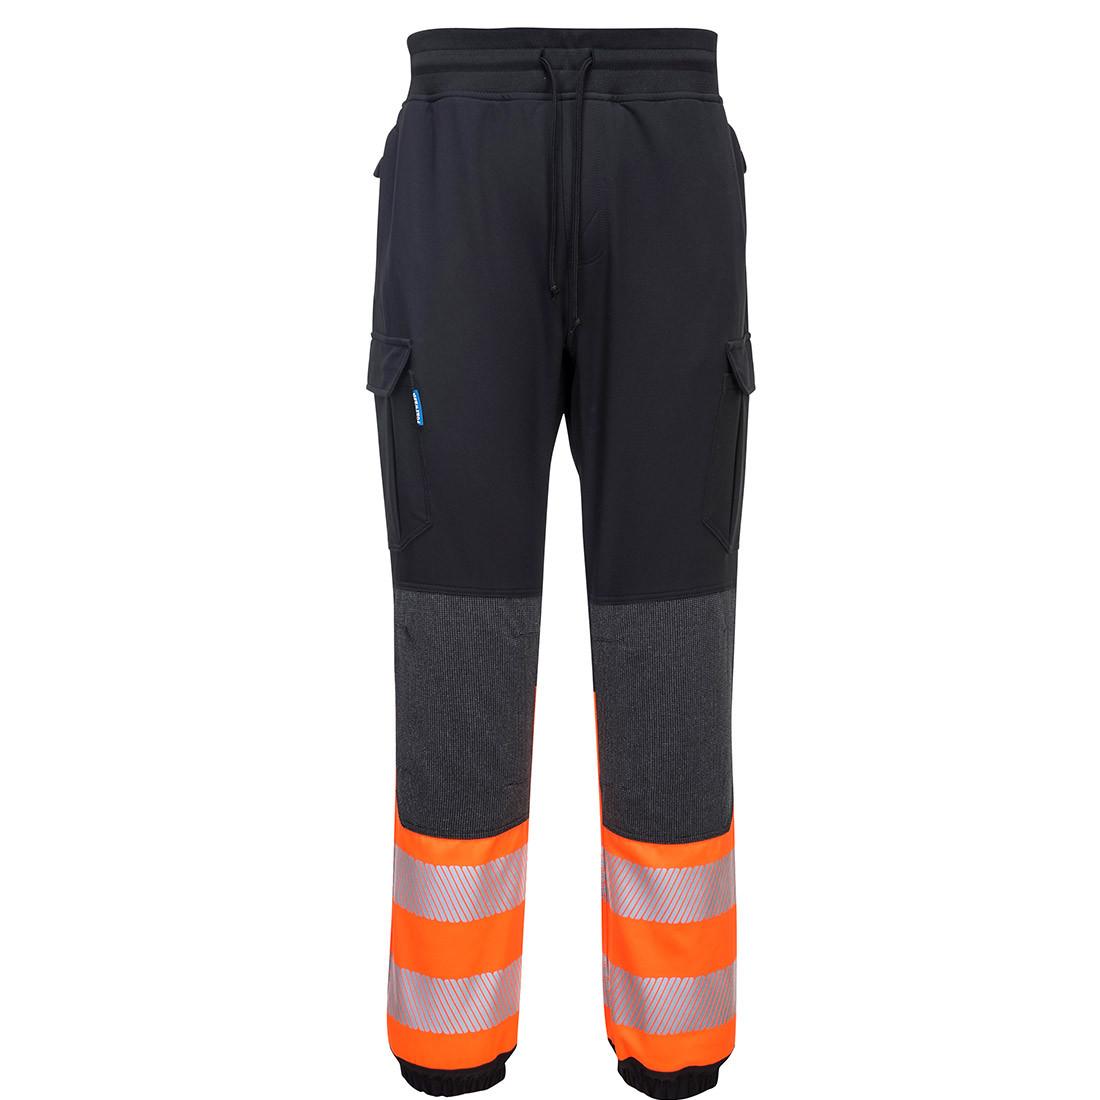 Pantaloni HI VIS Flexi gama KX3 - Imbracaminte de protectie